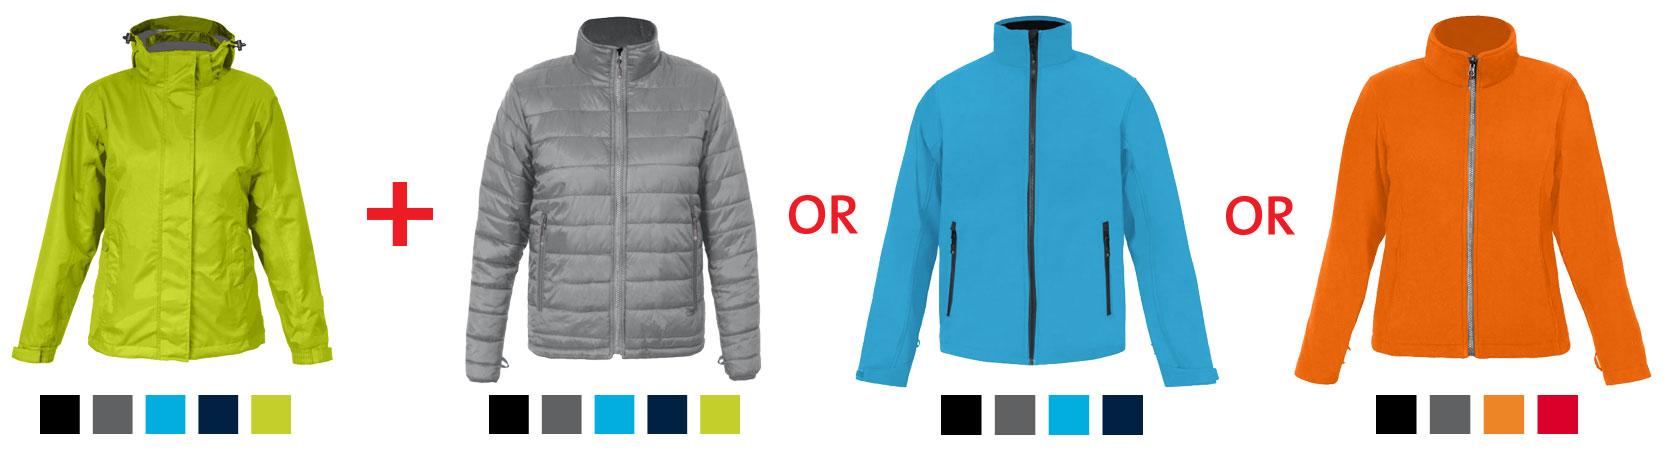 standard_thumb_4-in-1-jacket.jpg